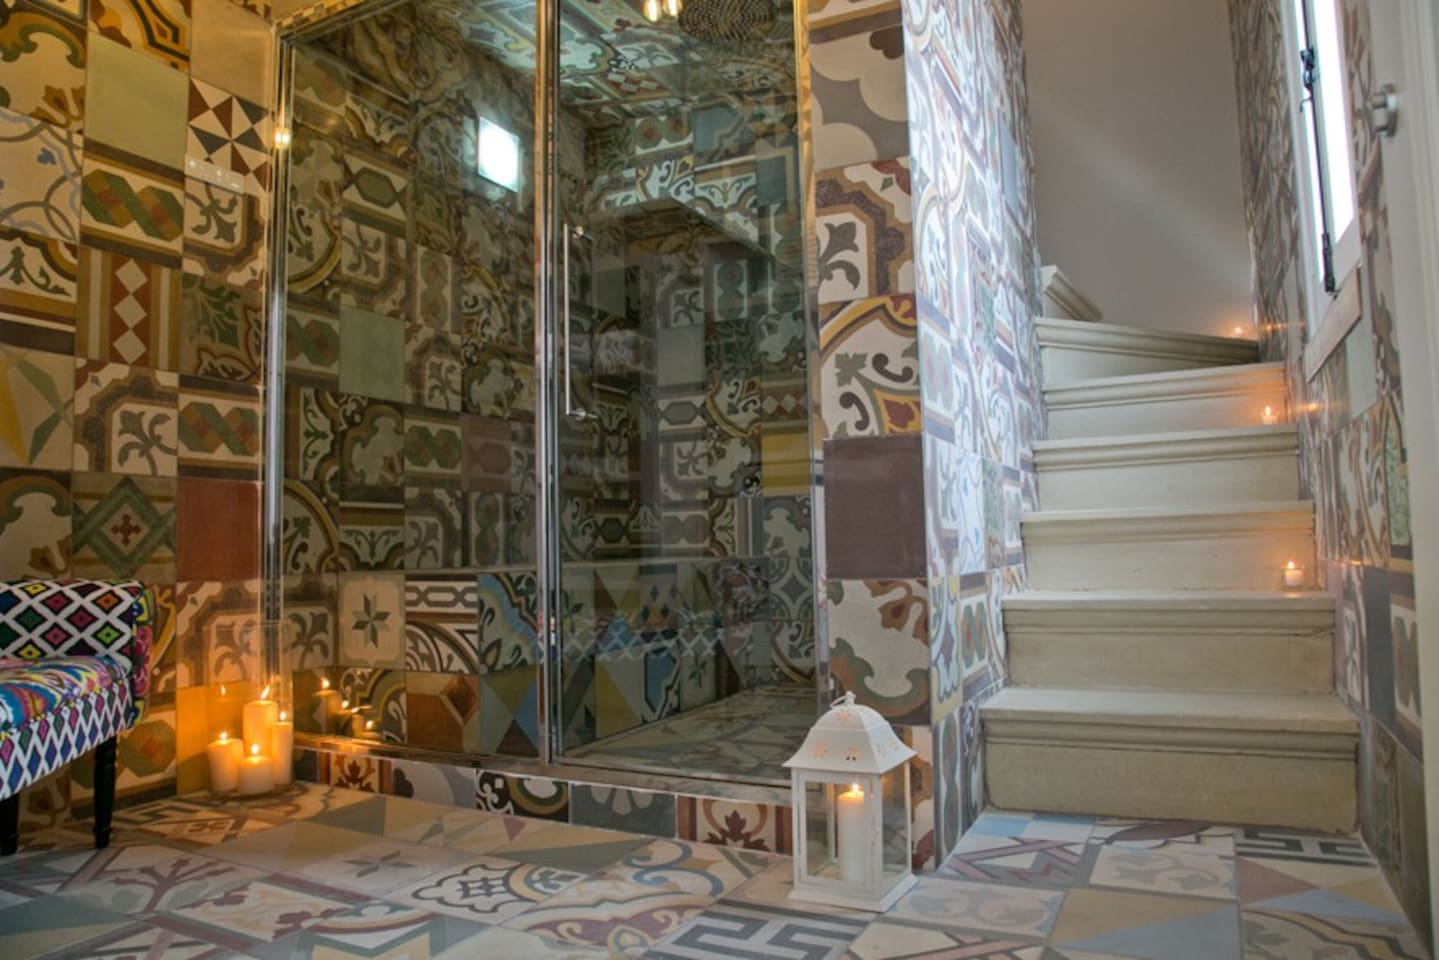 Arco Cadura B&B - Bagno Turco e Sauna - Bed and breakfasts for Rent ...